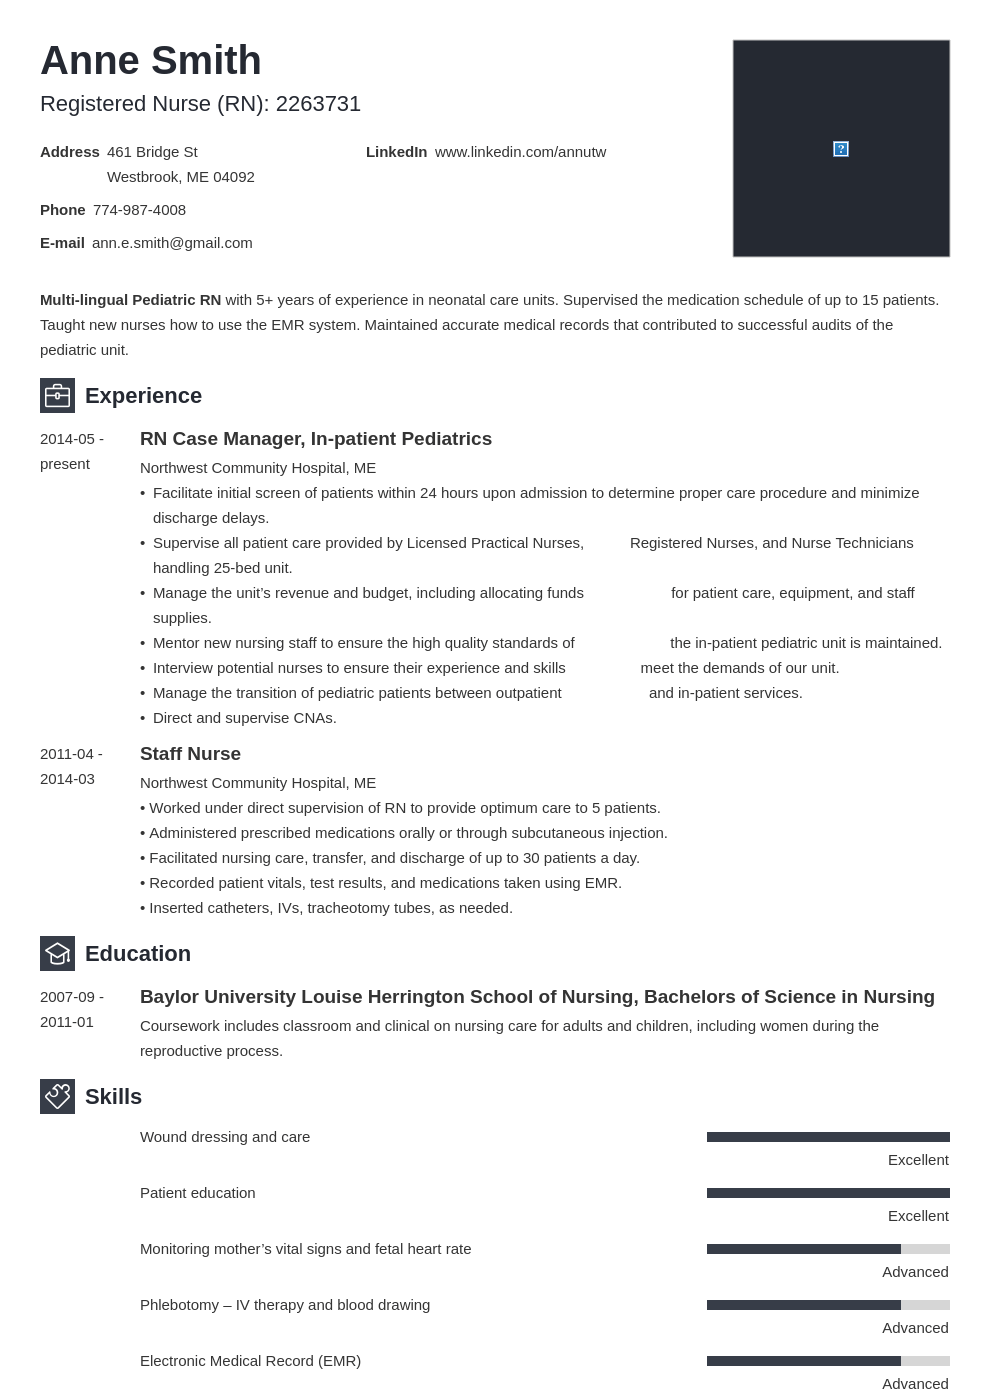 Nursing Resume Examples Template Newcast Resume Examples Nursing Resume Examples Nursing Resume